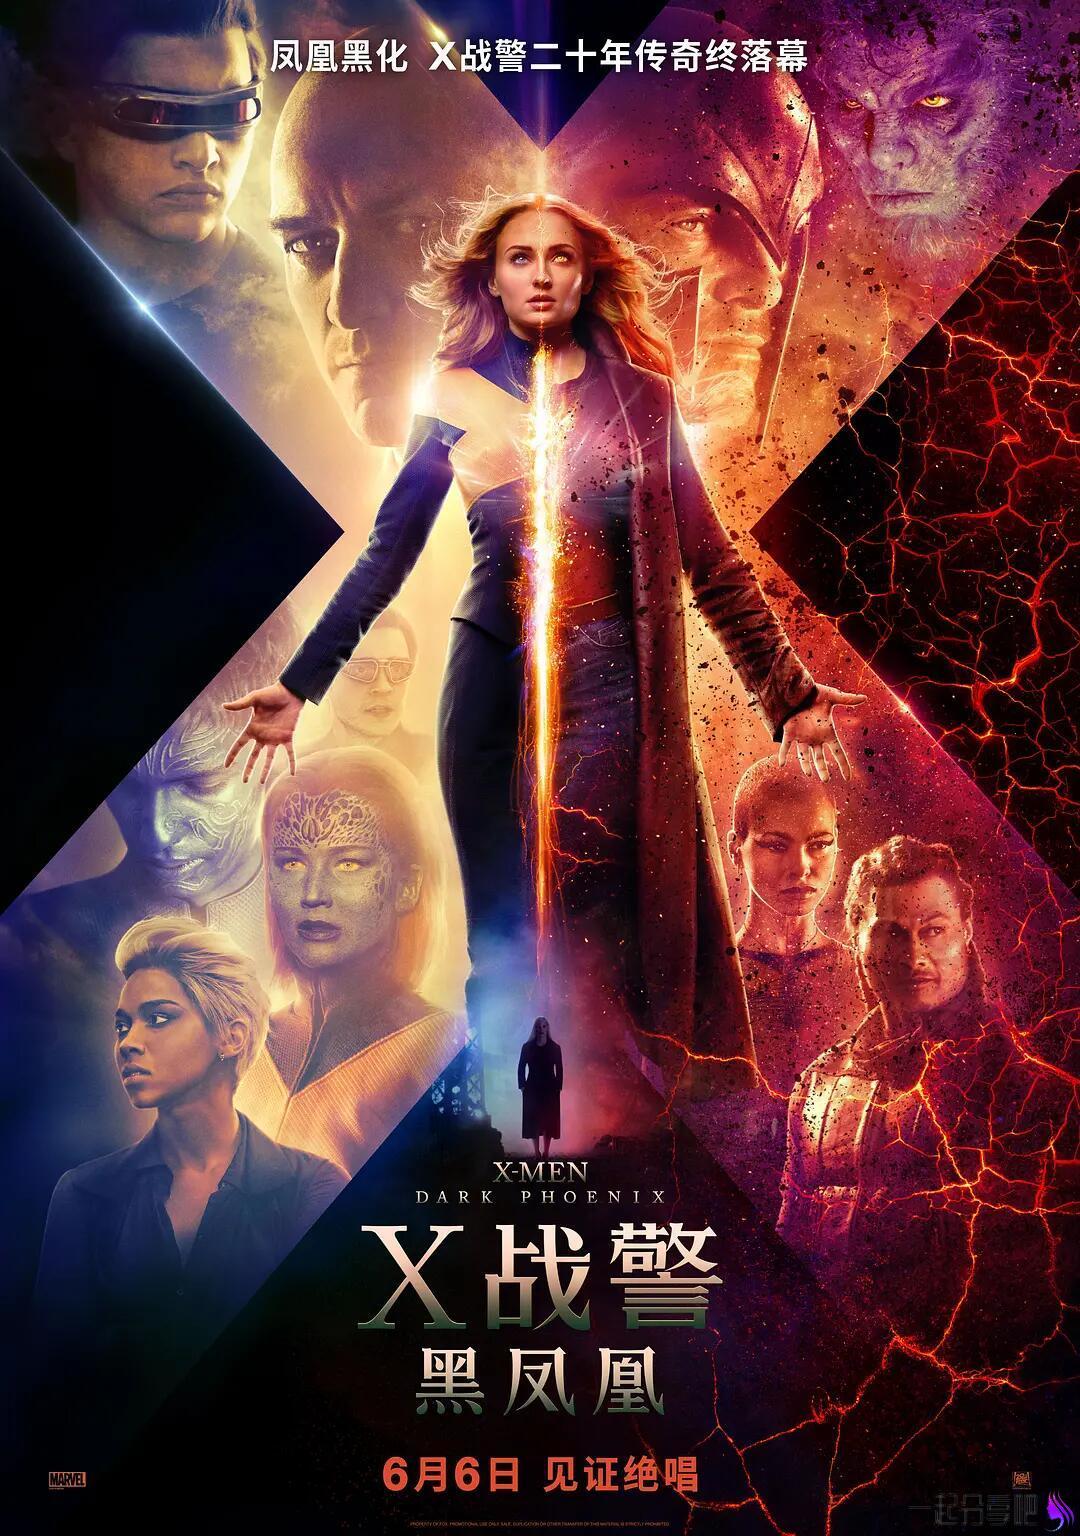 《X战警:黑凤凰》HD1080p蓝光中字版 全网首发 第1张